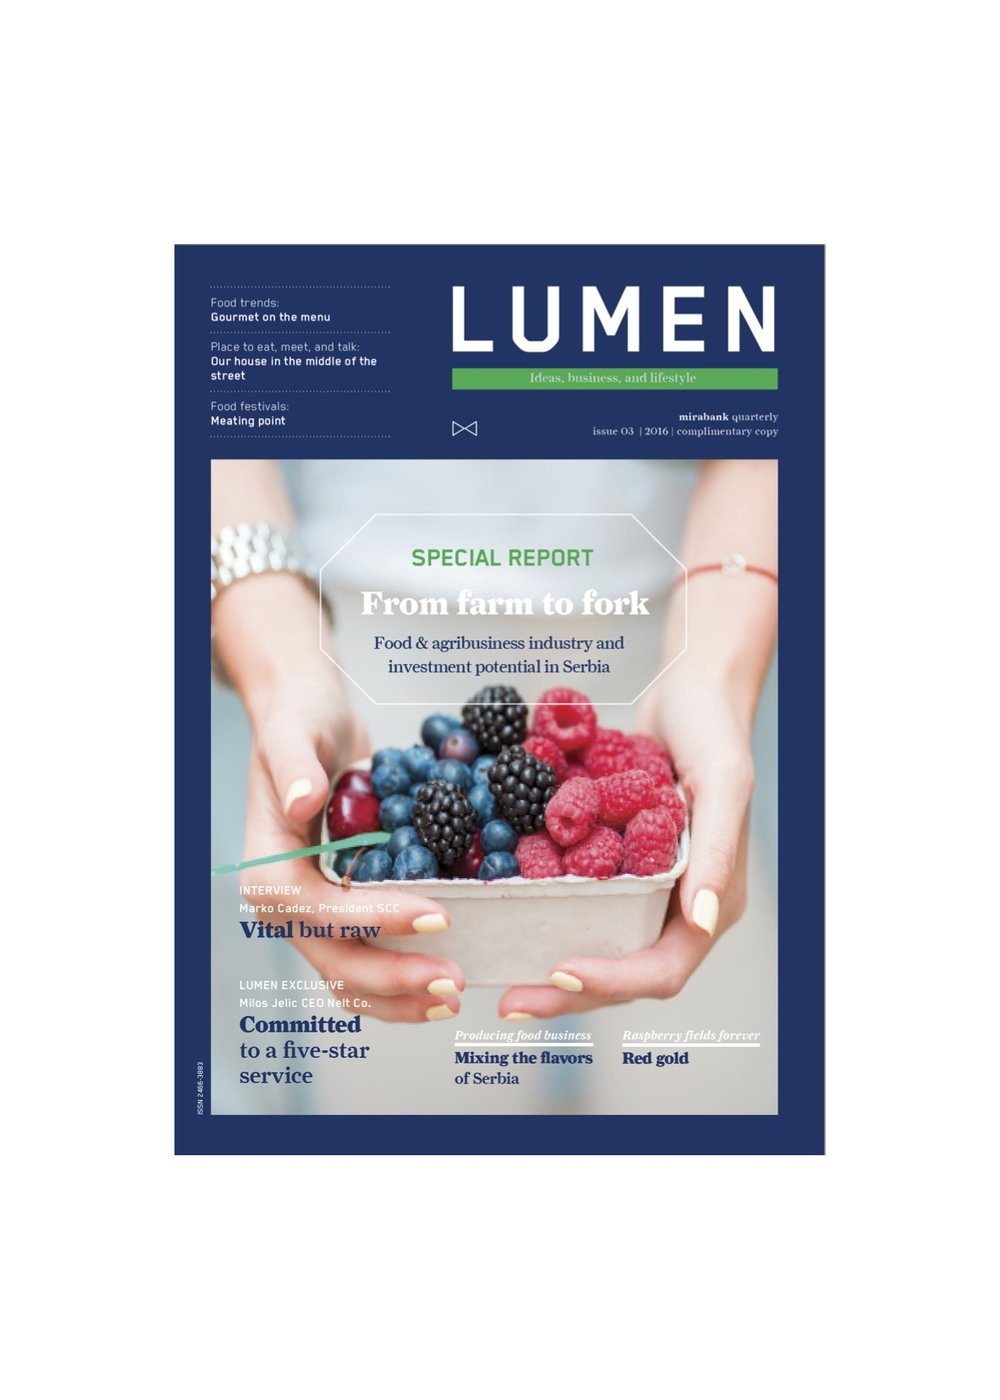 Matt Morley _ Lumen3 (cover).jpg